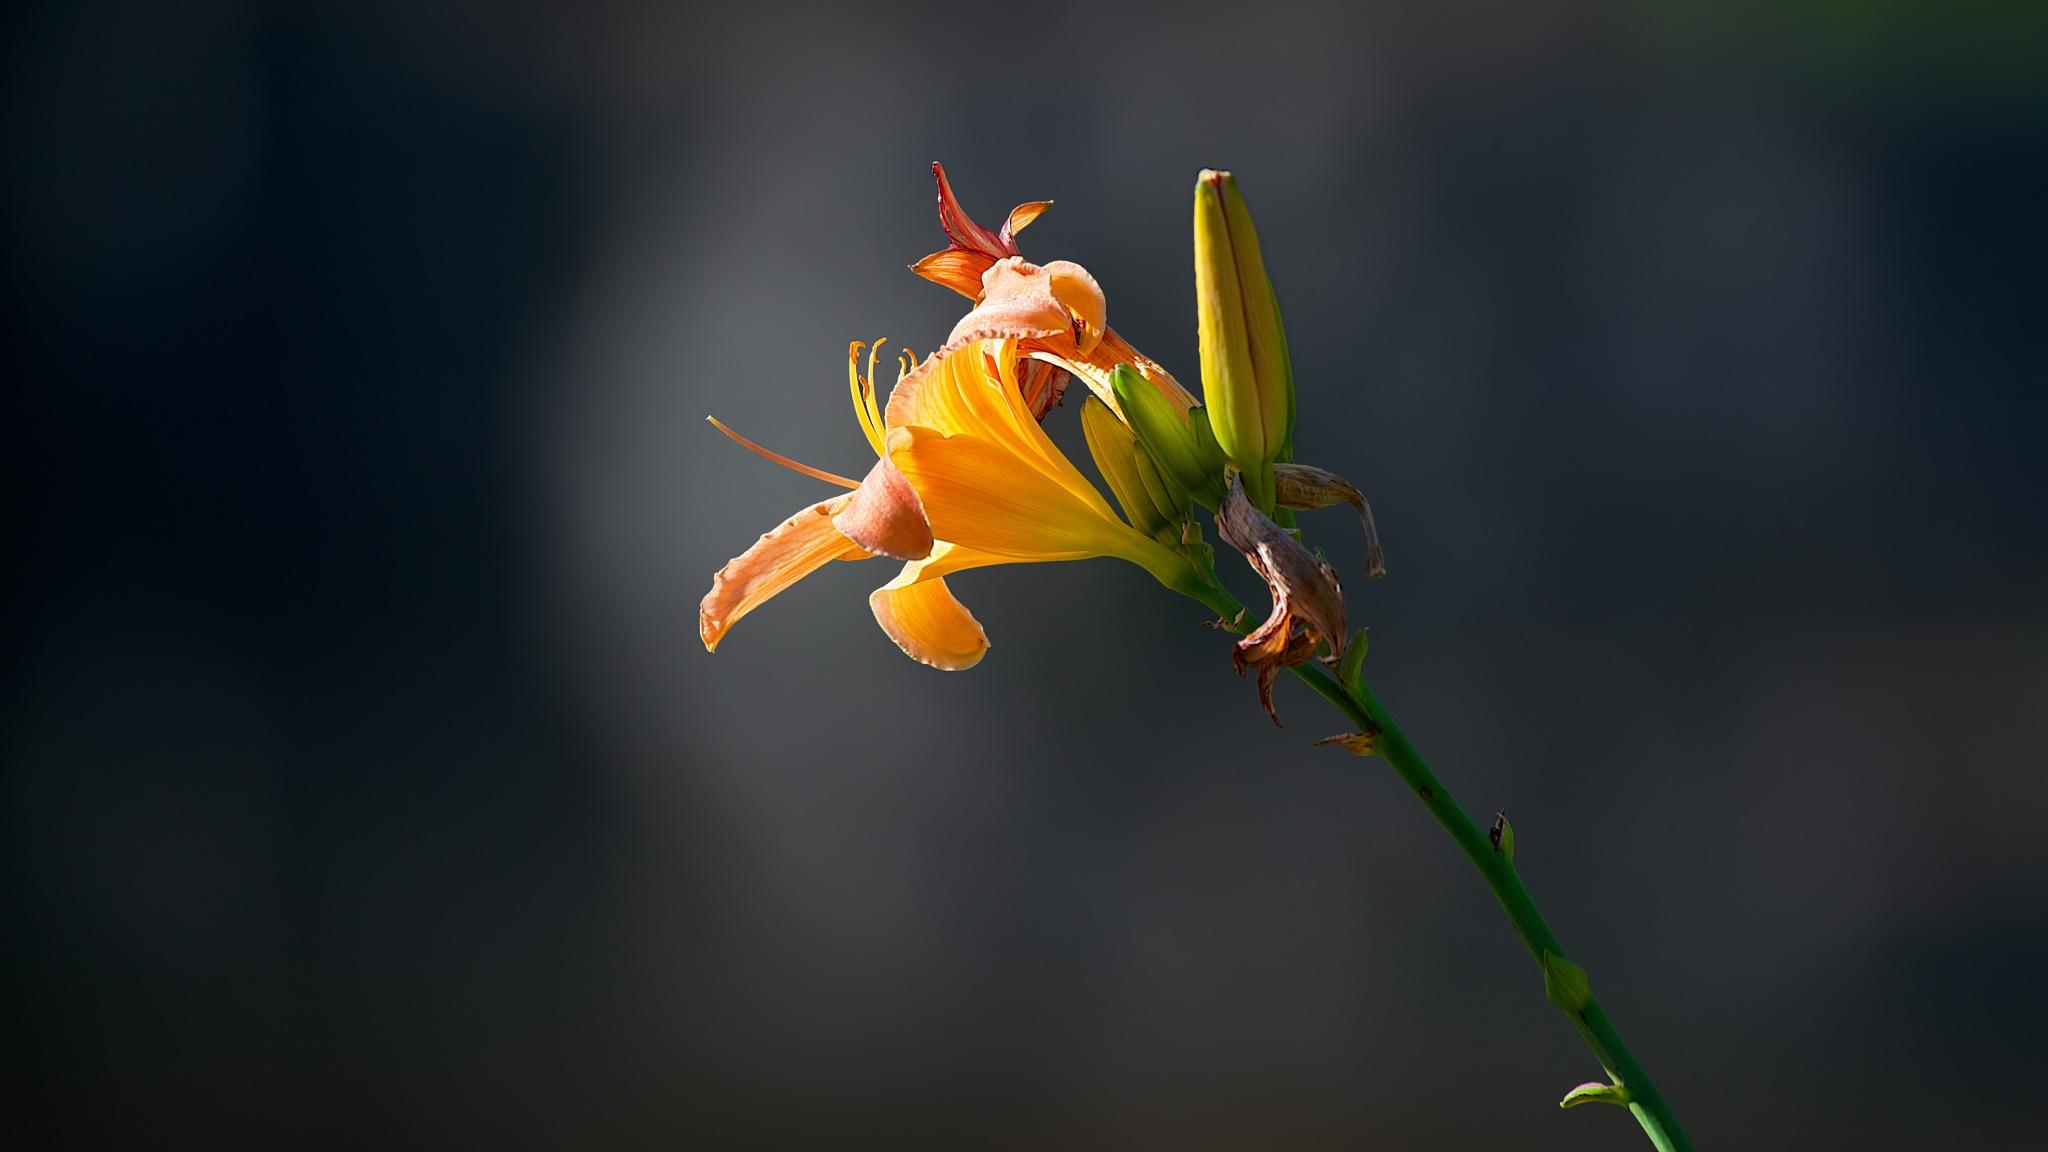 Nature in the spotlight by EmanuelPapamanolis